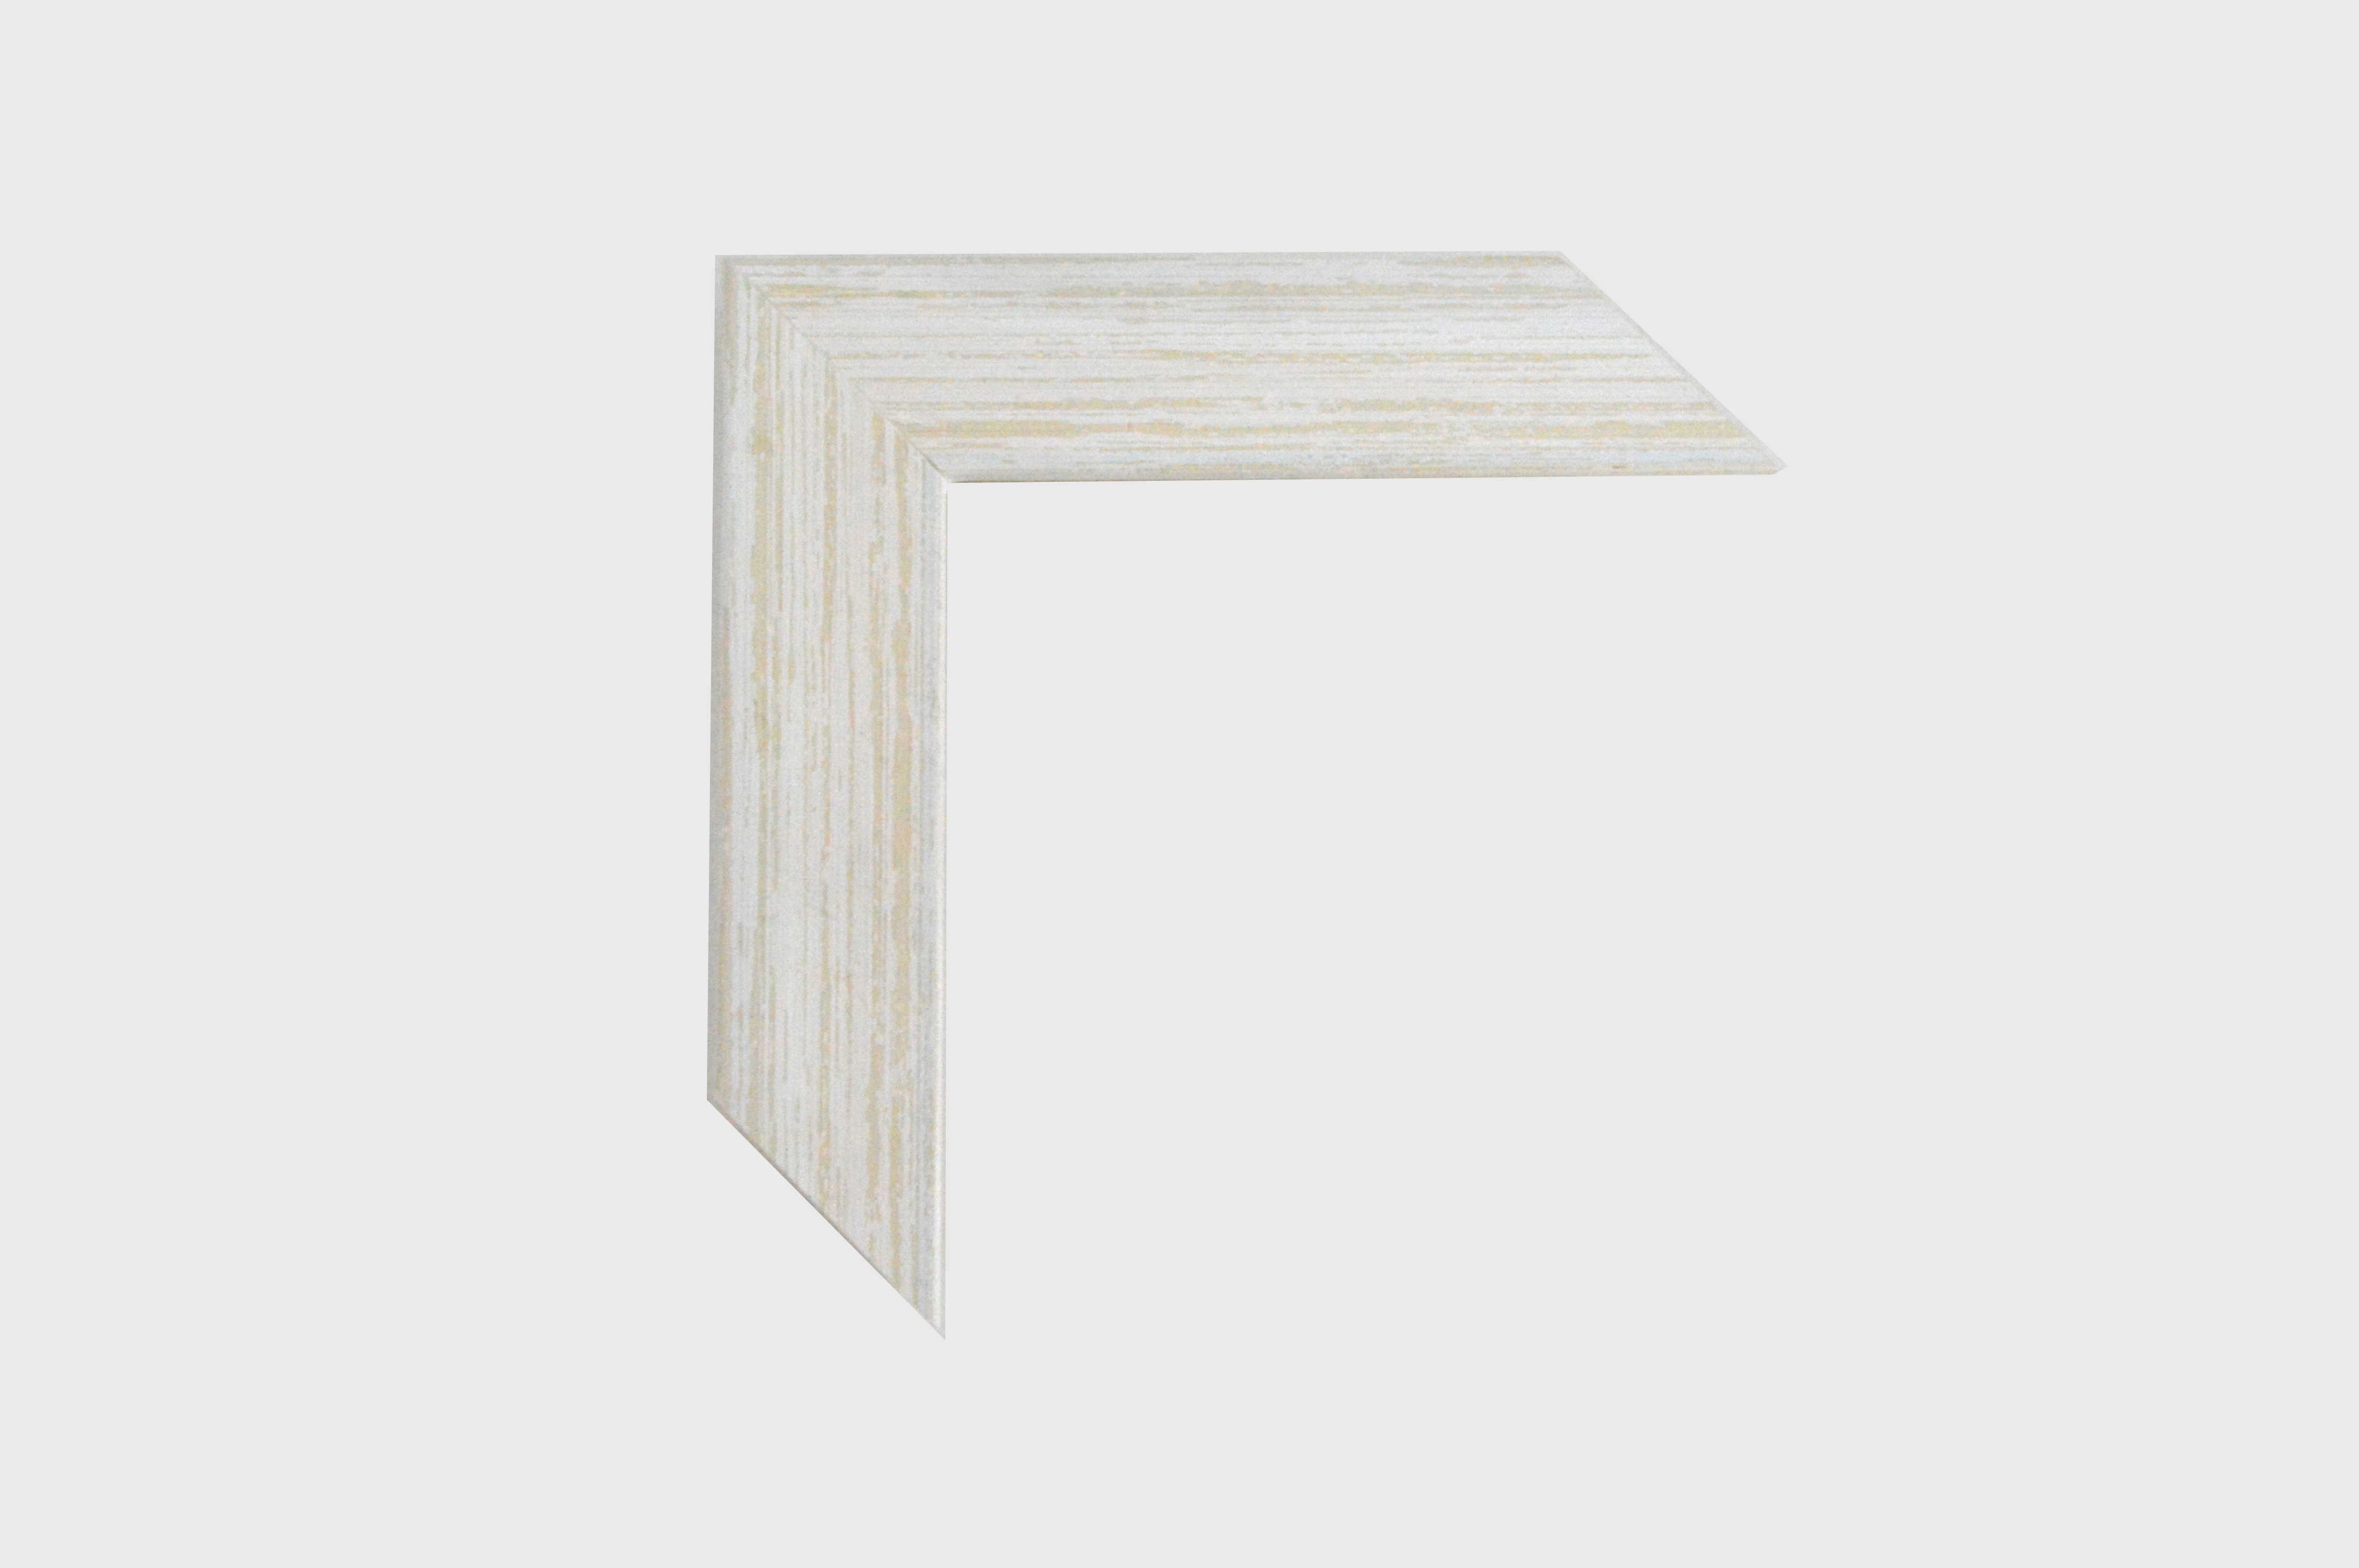 00800-112-BLANCA-ancho4cm